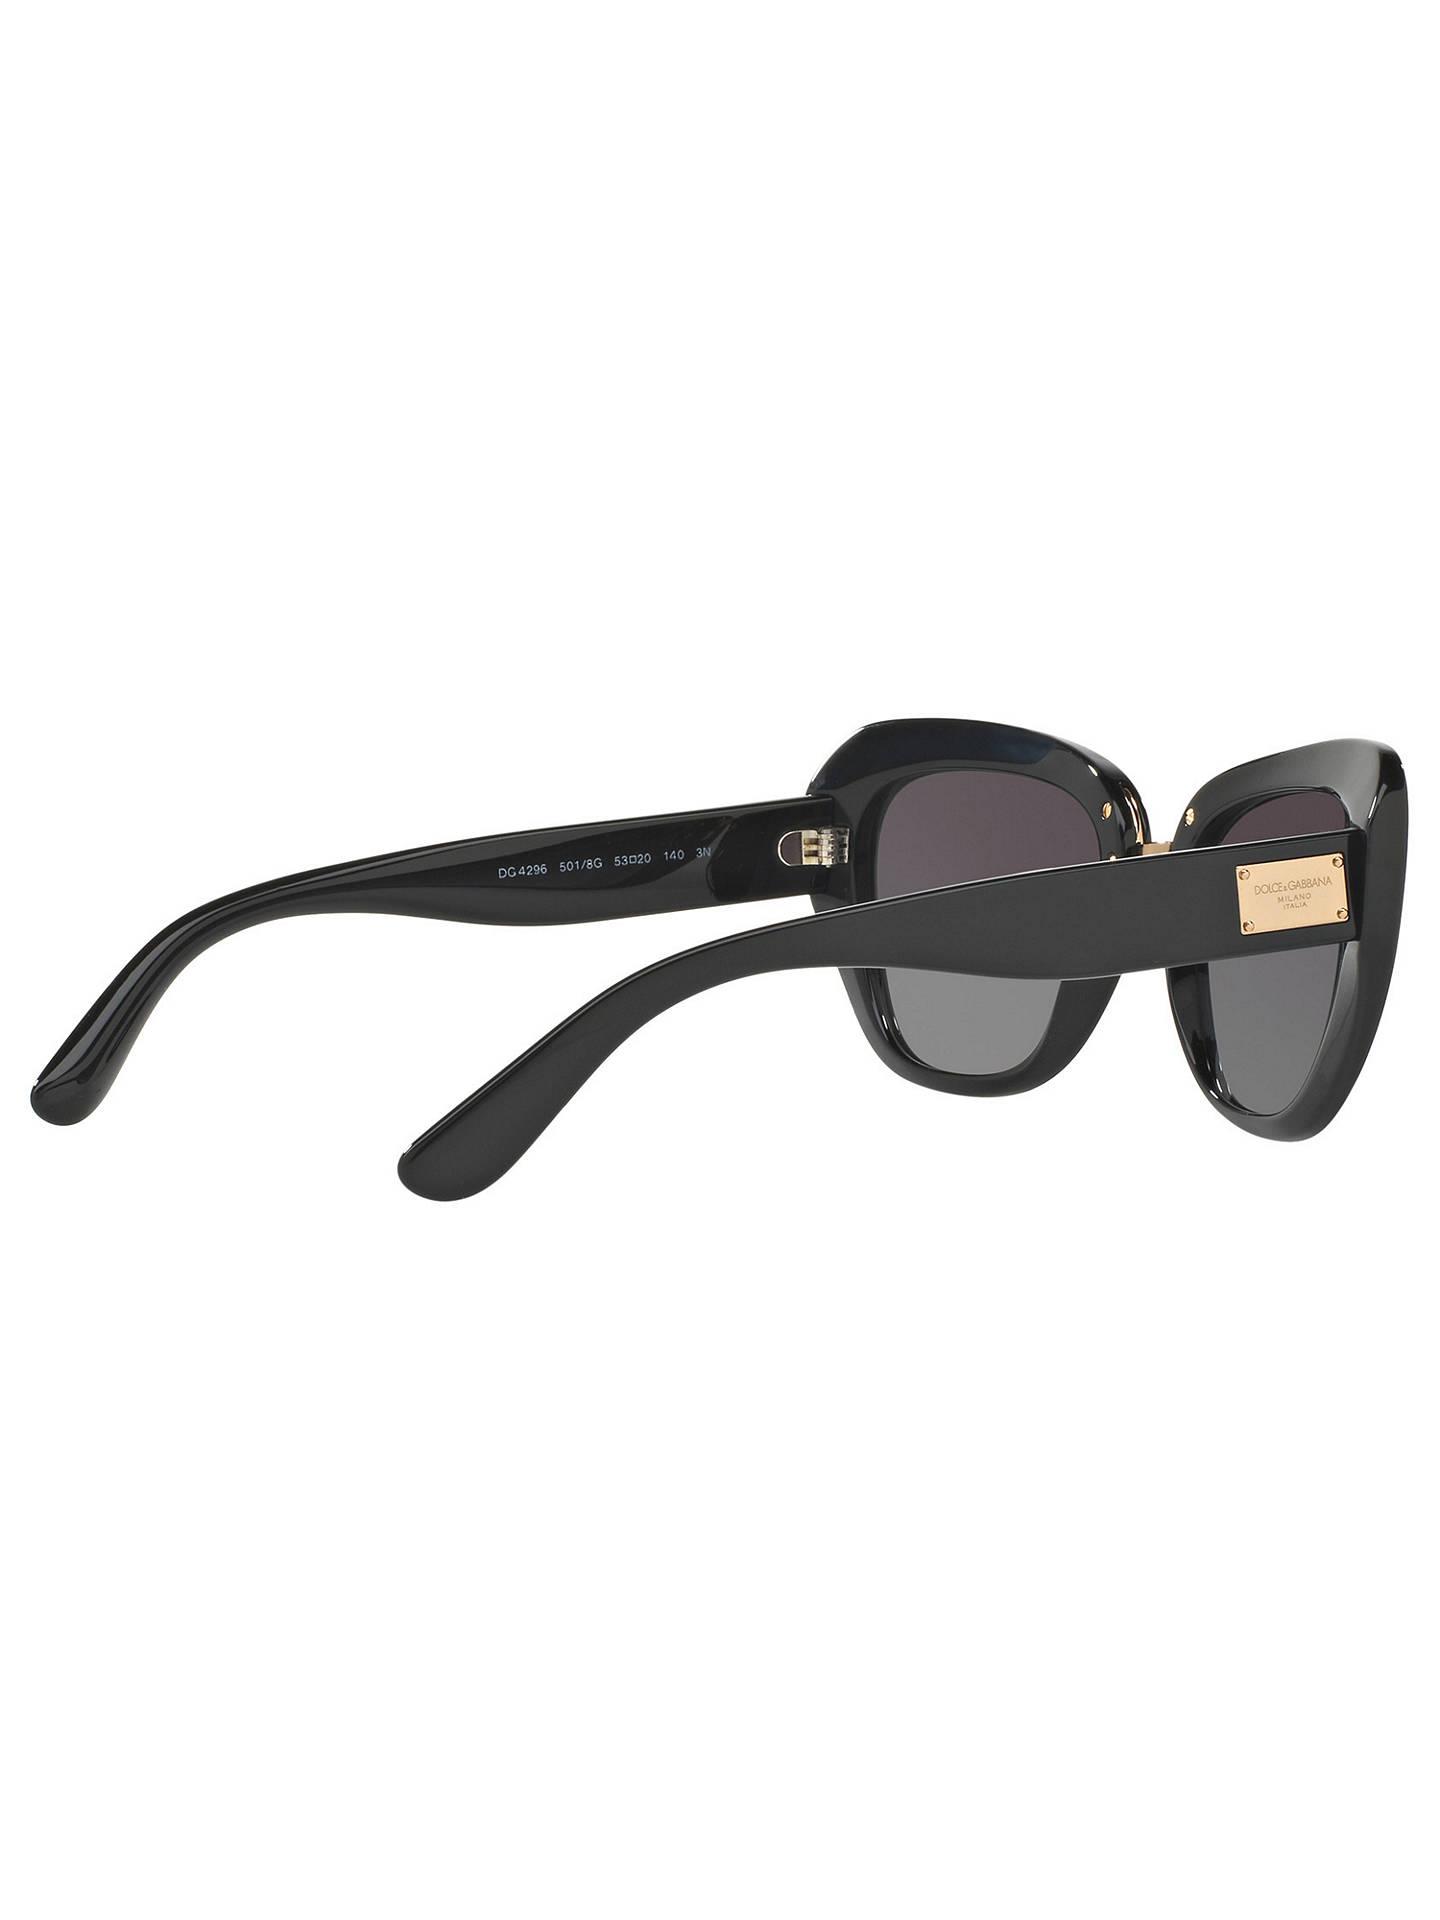 bdd8be6c2f6 Dolce   Gabbana DG4296 Cat s Eye Sunglasses at John Lewis   Partners